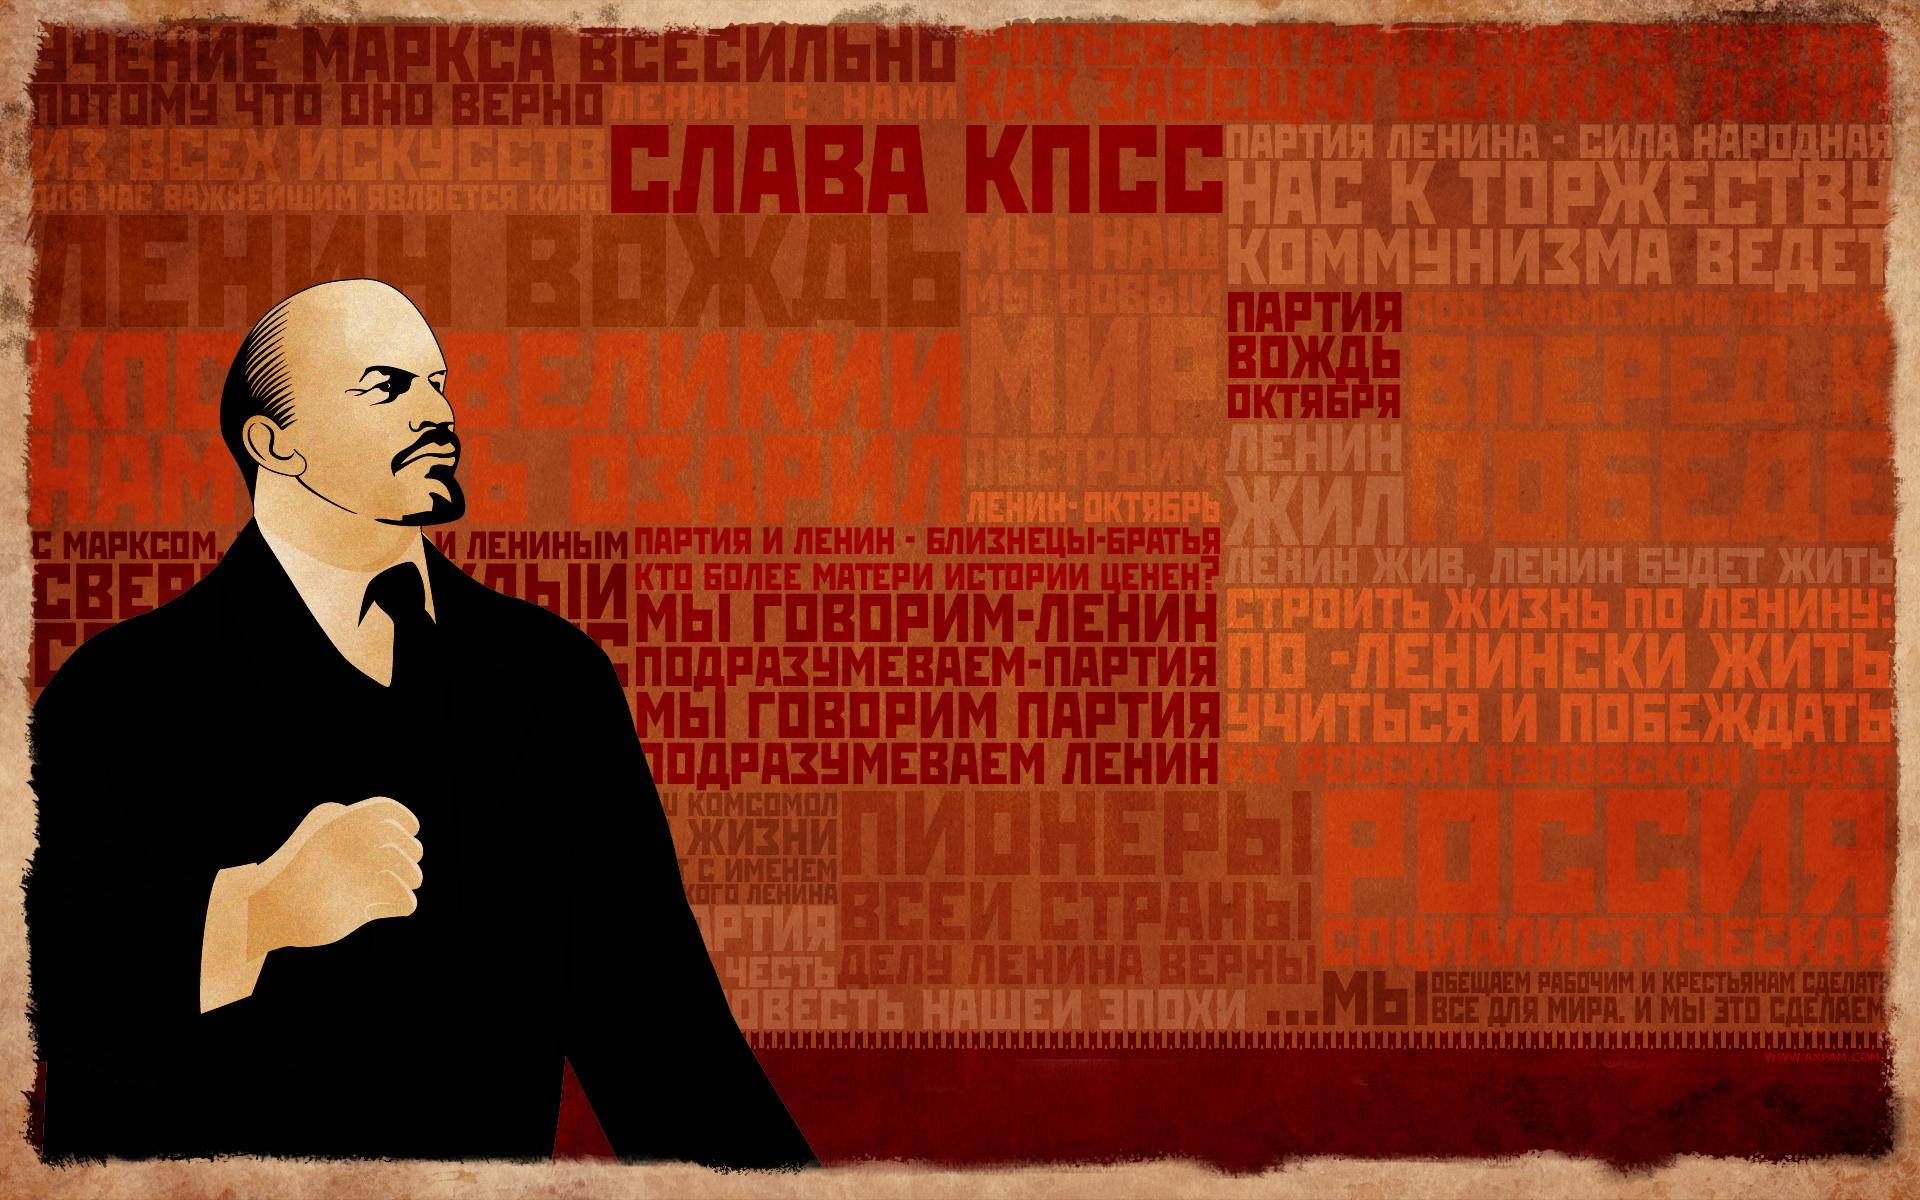 47] Vladimir Lenin Wallpaper on WallpaperSafari 1920x1200